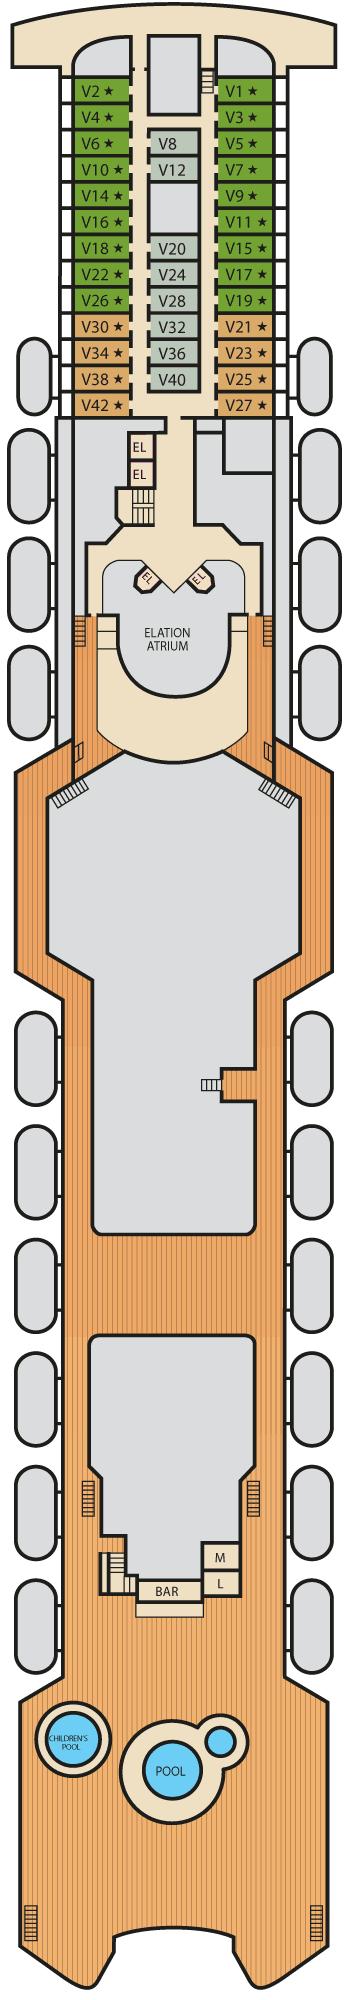 Carnival Elation - Verandah Deck